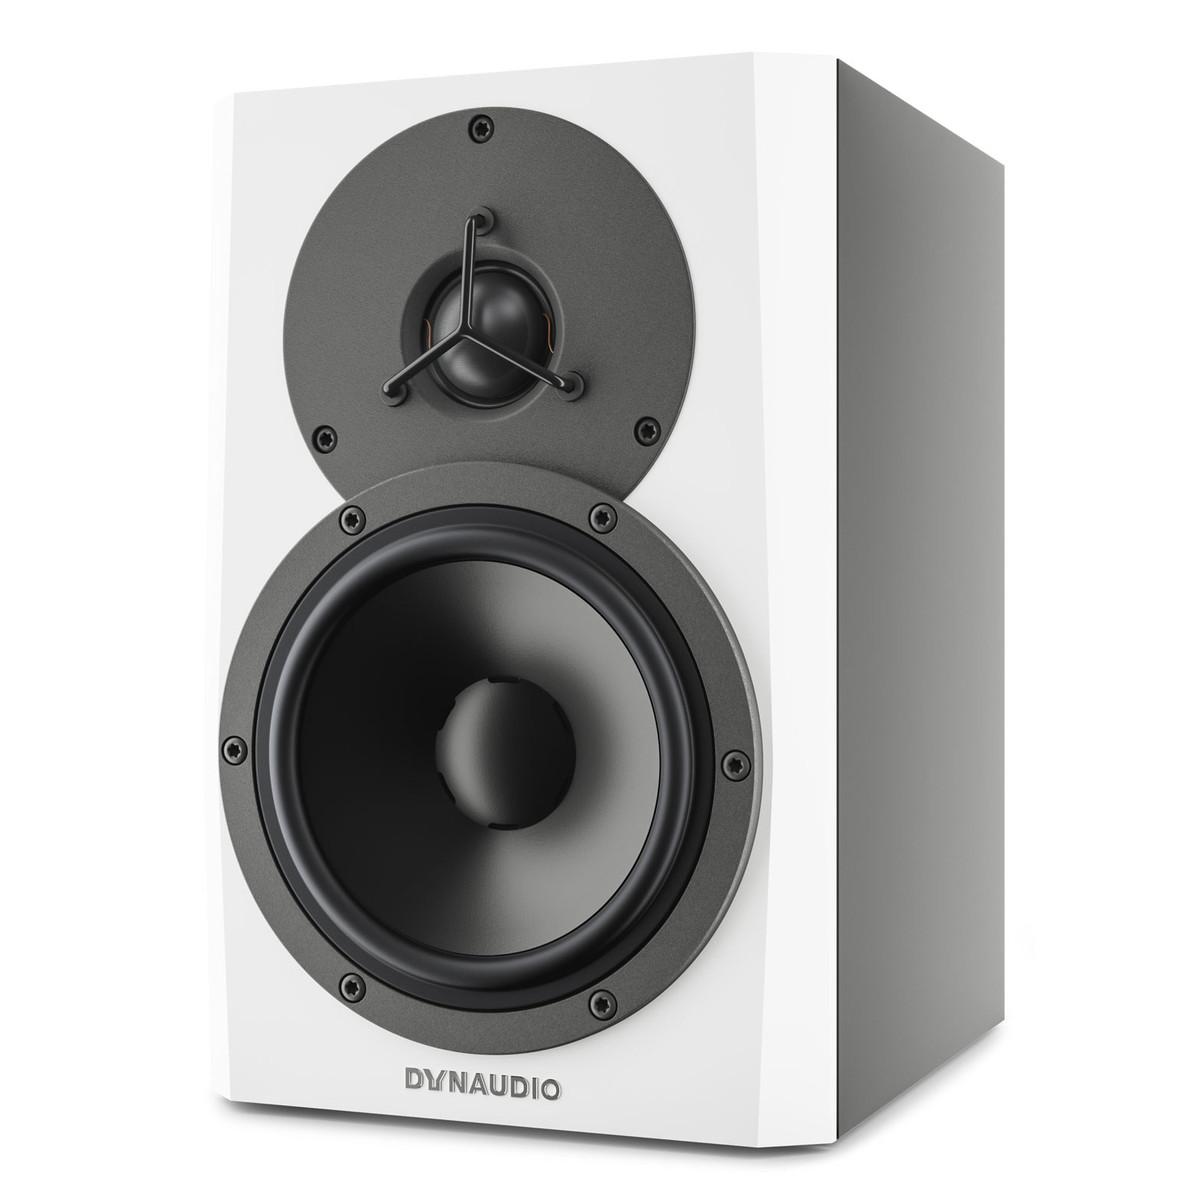 dynaudio lyd 5 near field studio monitor single at gear4music. Black Bedroom Furniture Sets. Home Design Ideas